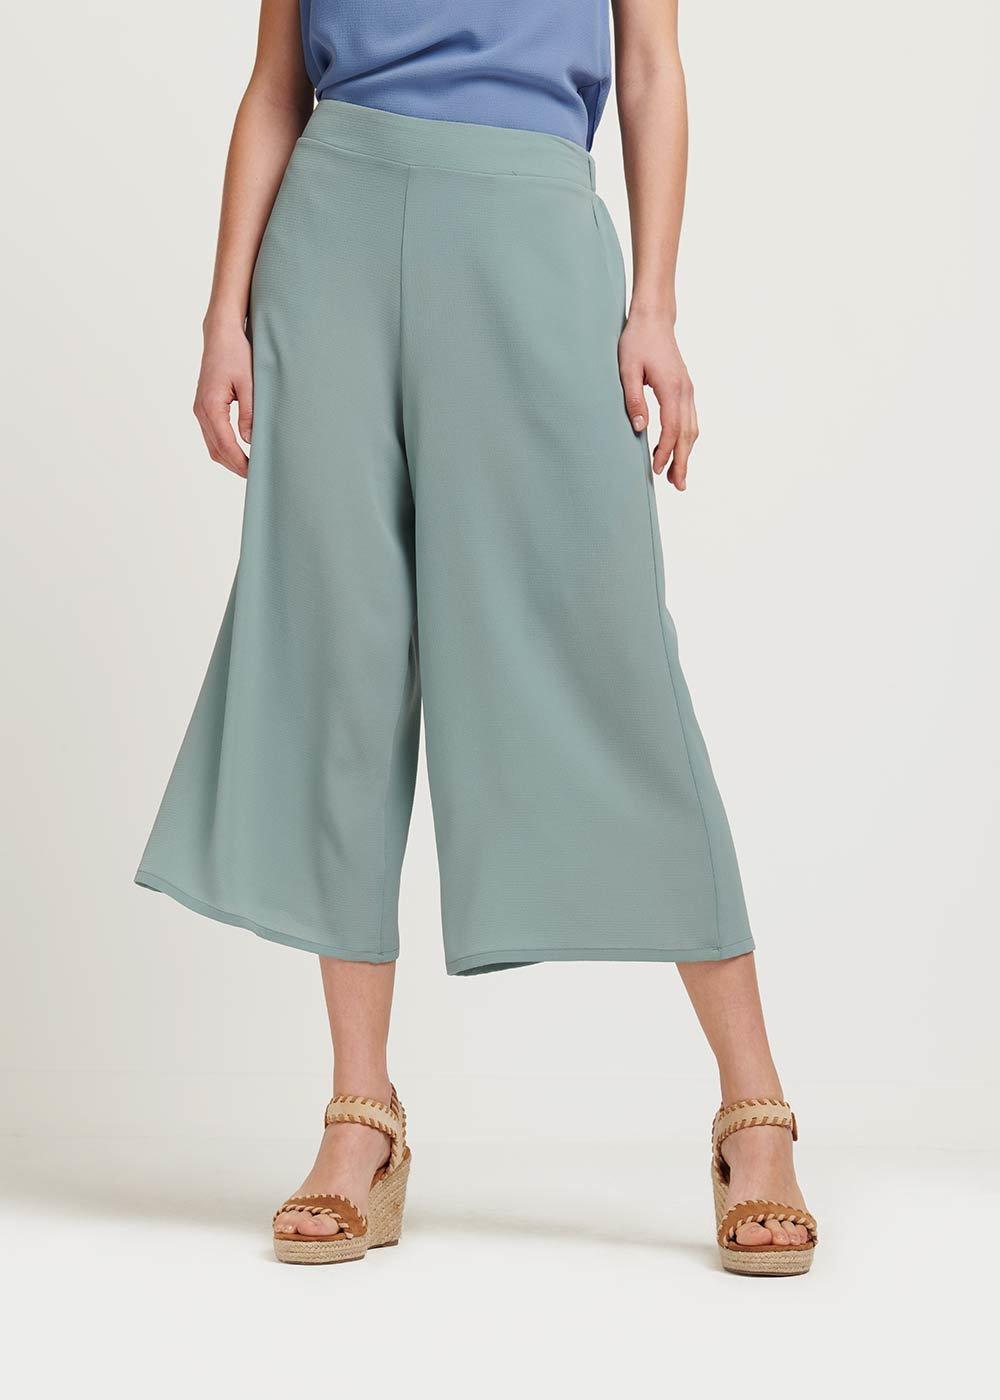 Megan capri pants with waist elastic band - Red - Woman